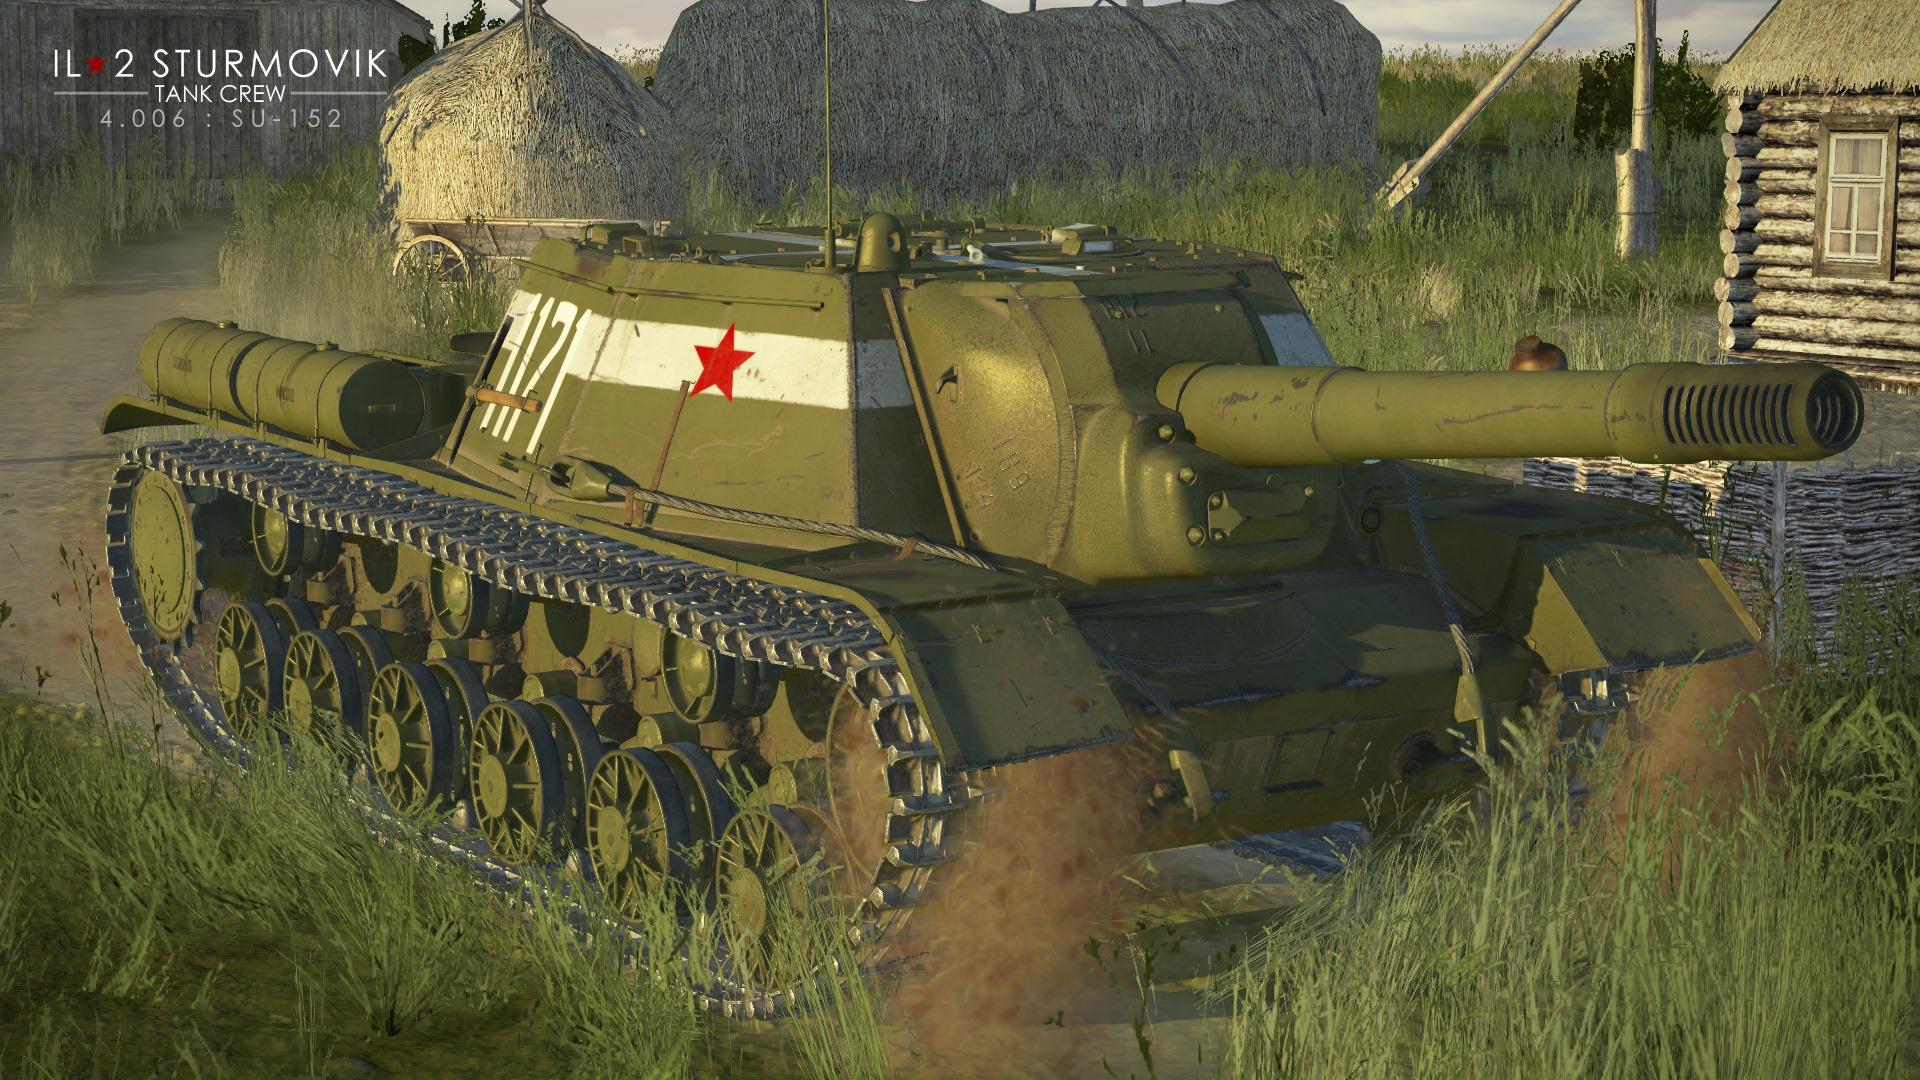 IL-2 Sturmovik: Great Battles passe en version 4.006